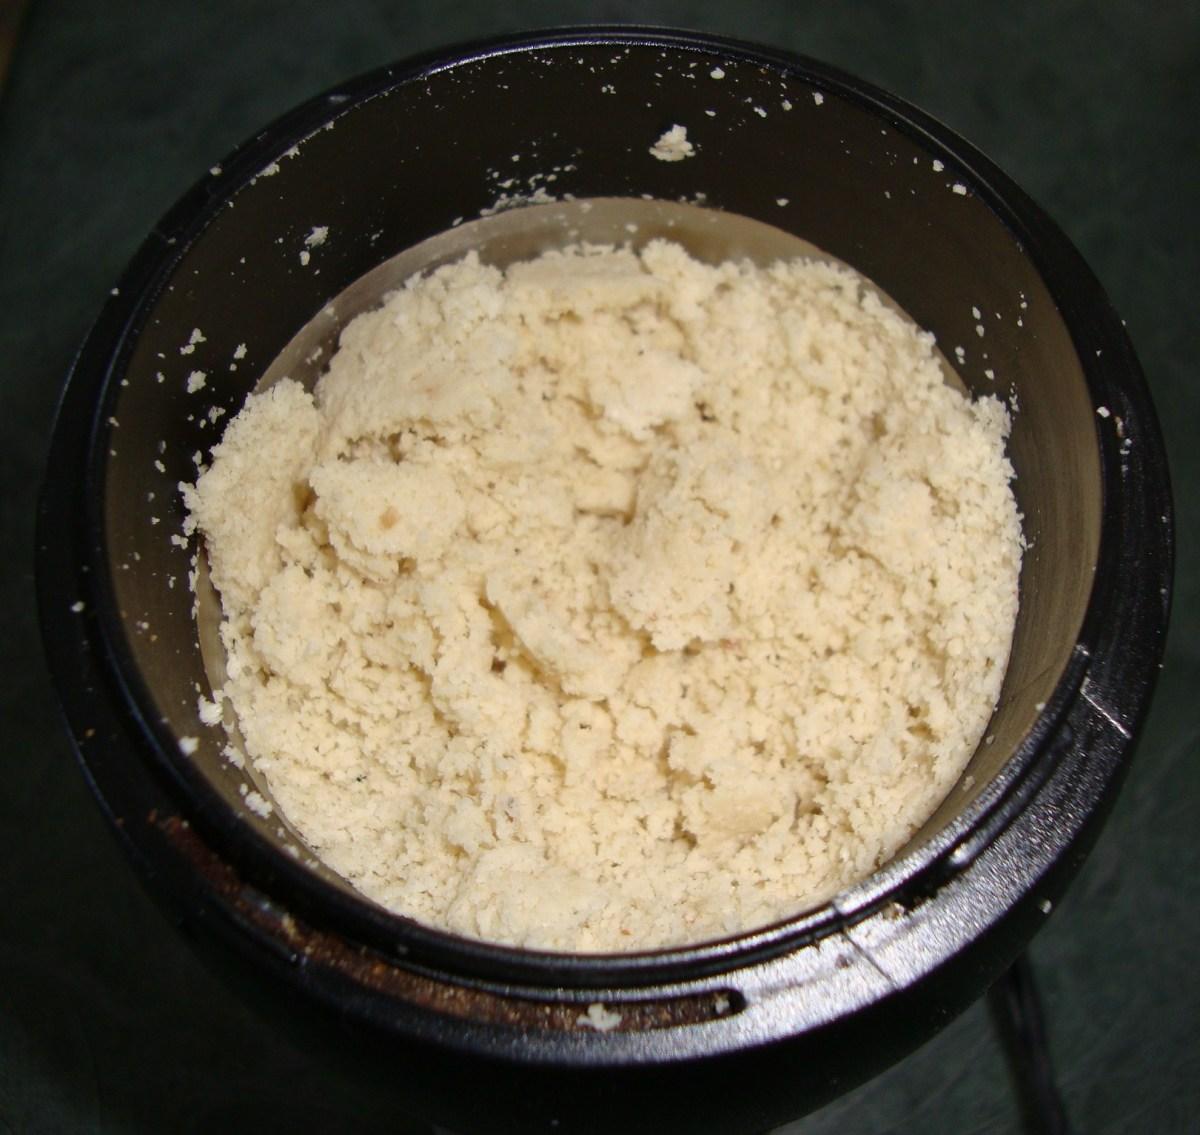 Ground sesame seeds turn into a creamy meal-like substance.